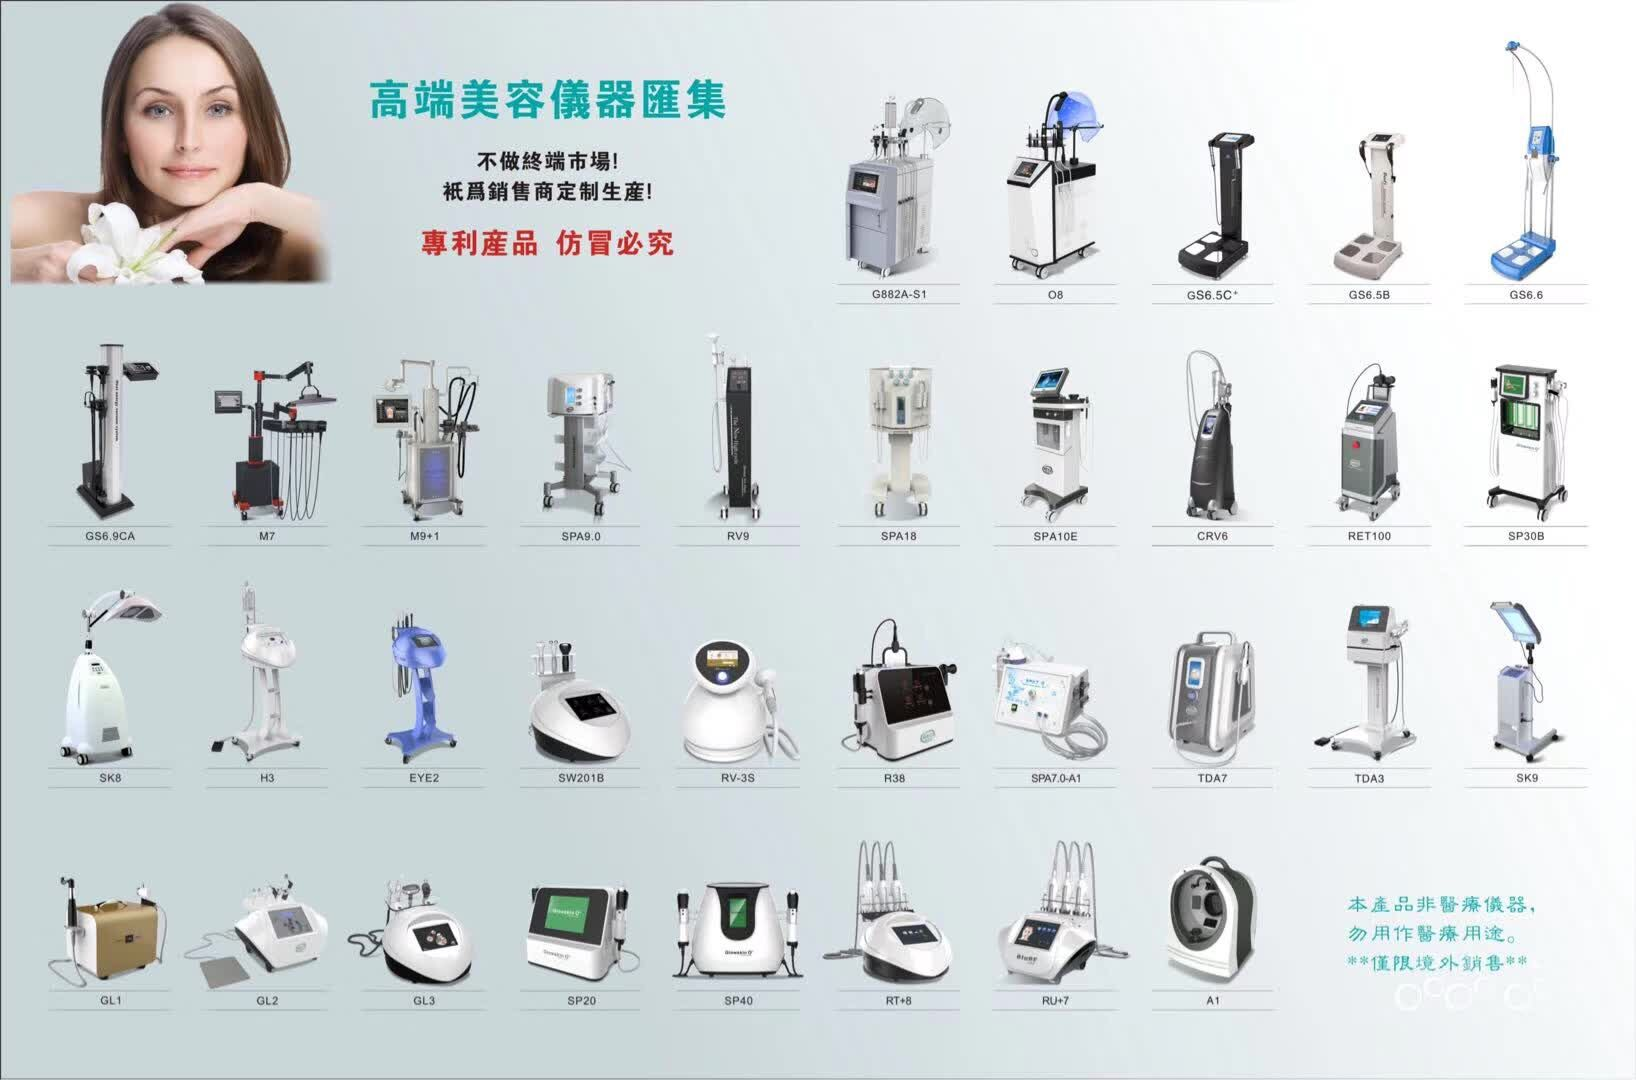 Produto de tendência mais vendido 2019 o9 gerador de oxigênio equipamento de beleza multifuncional para cuidados de beleza do rosto e do corpo